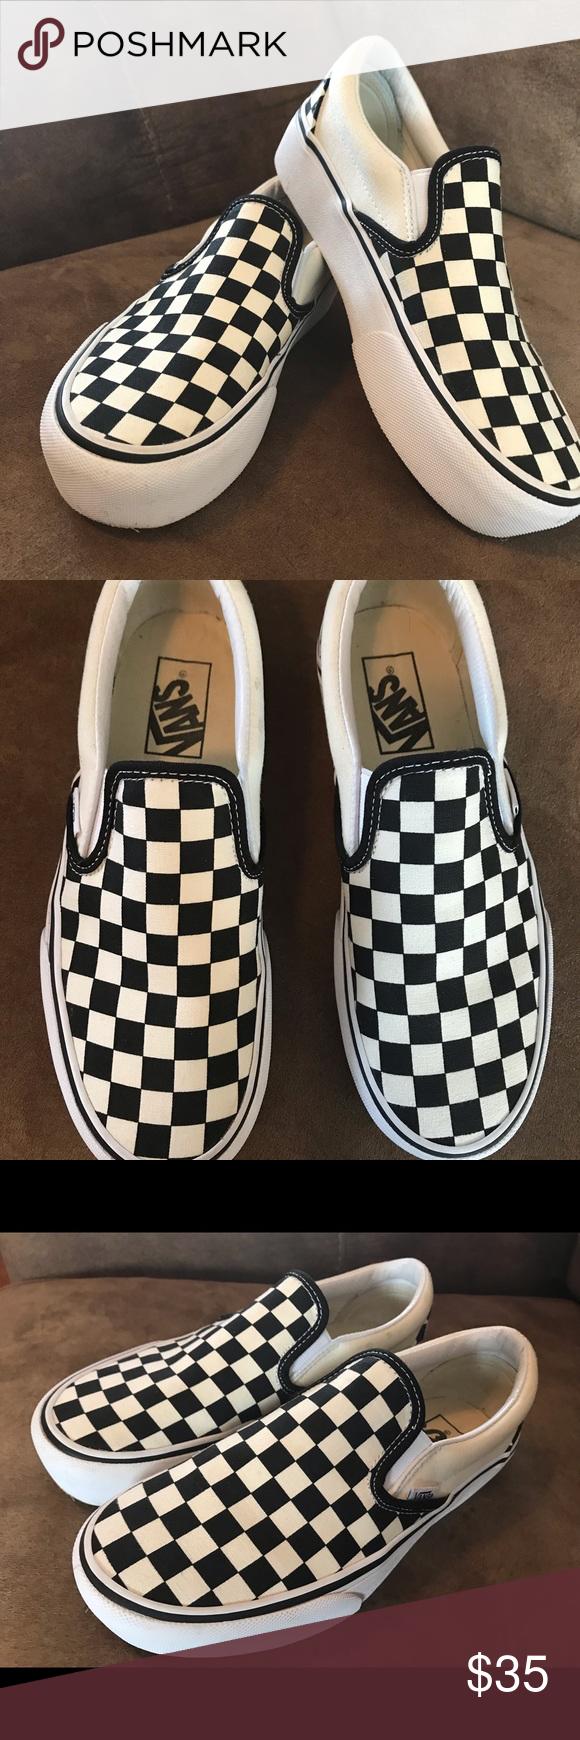 Vans Checkerboard slip-on Men's 5.0